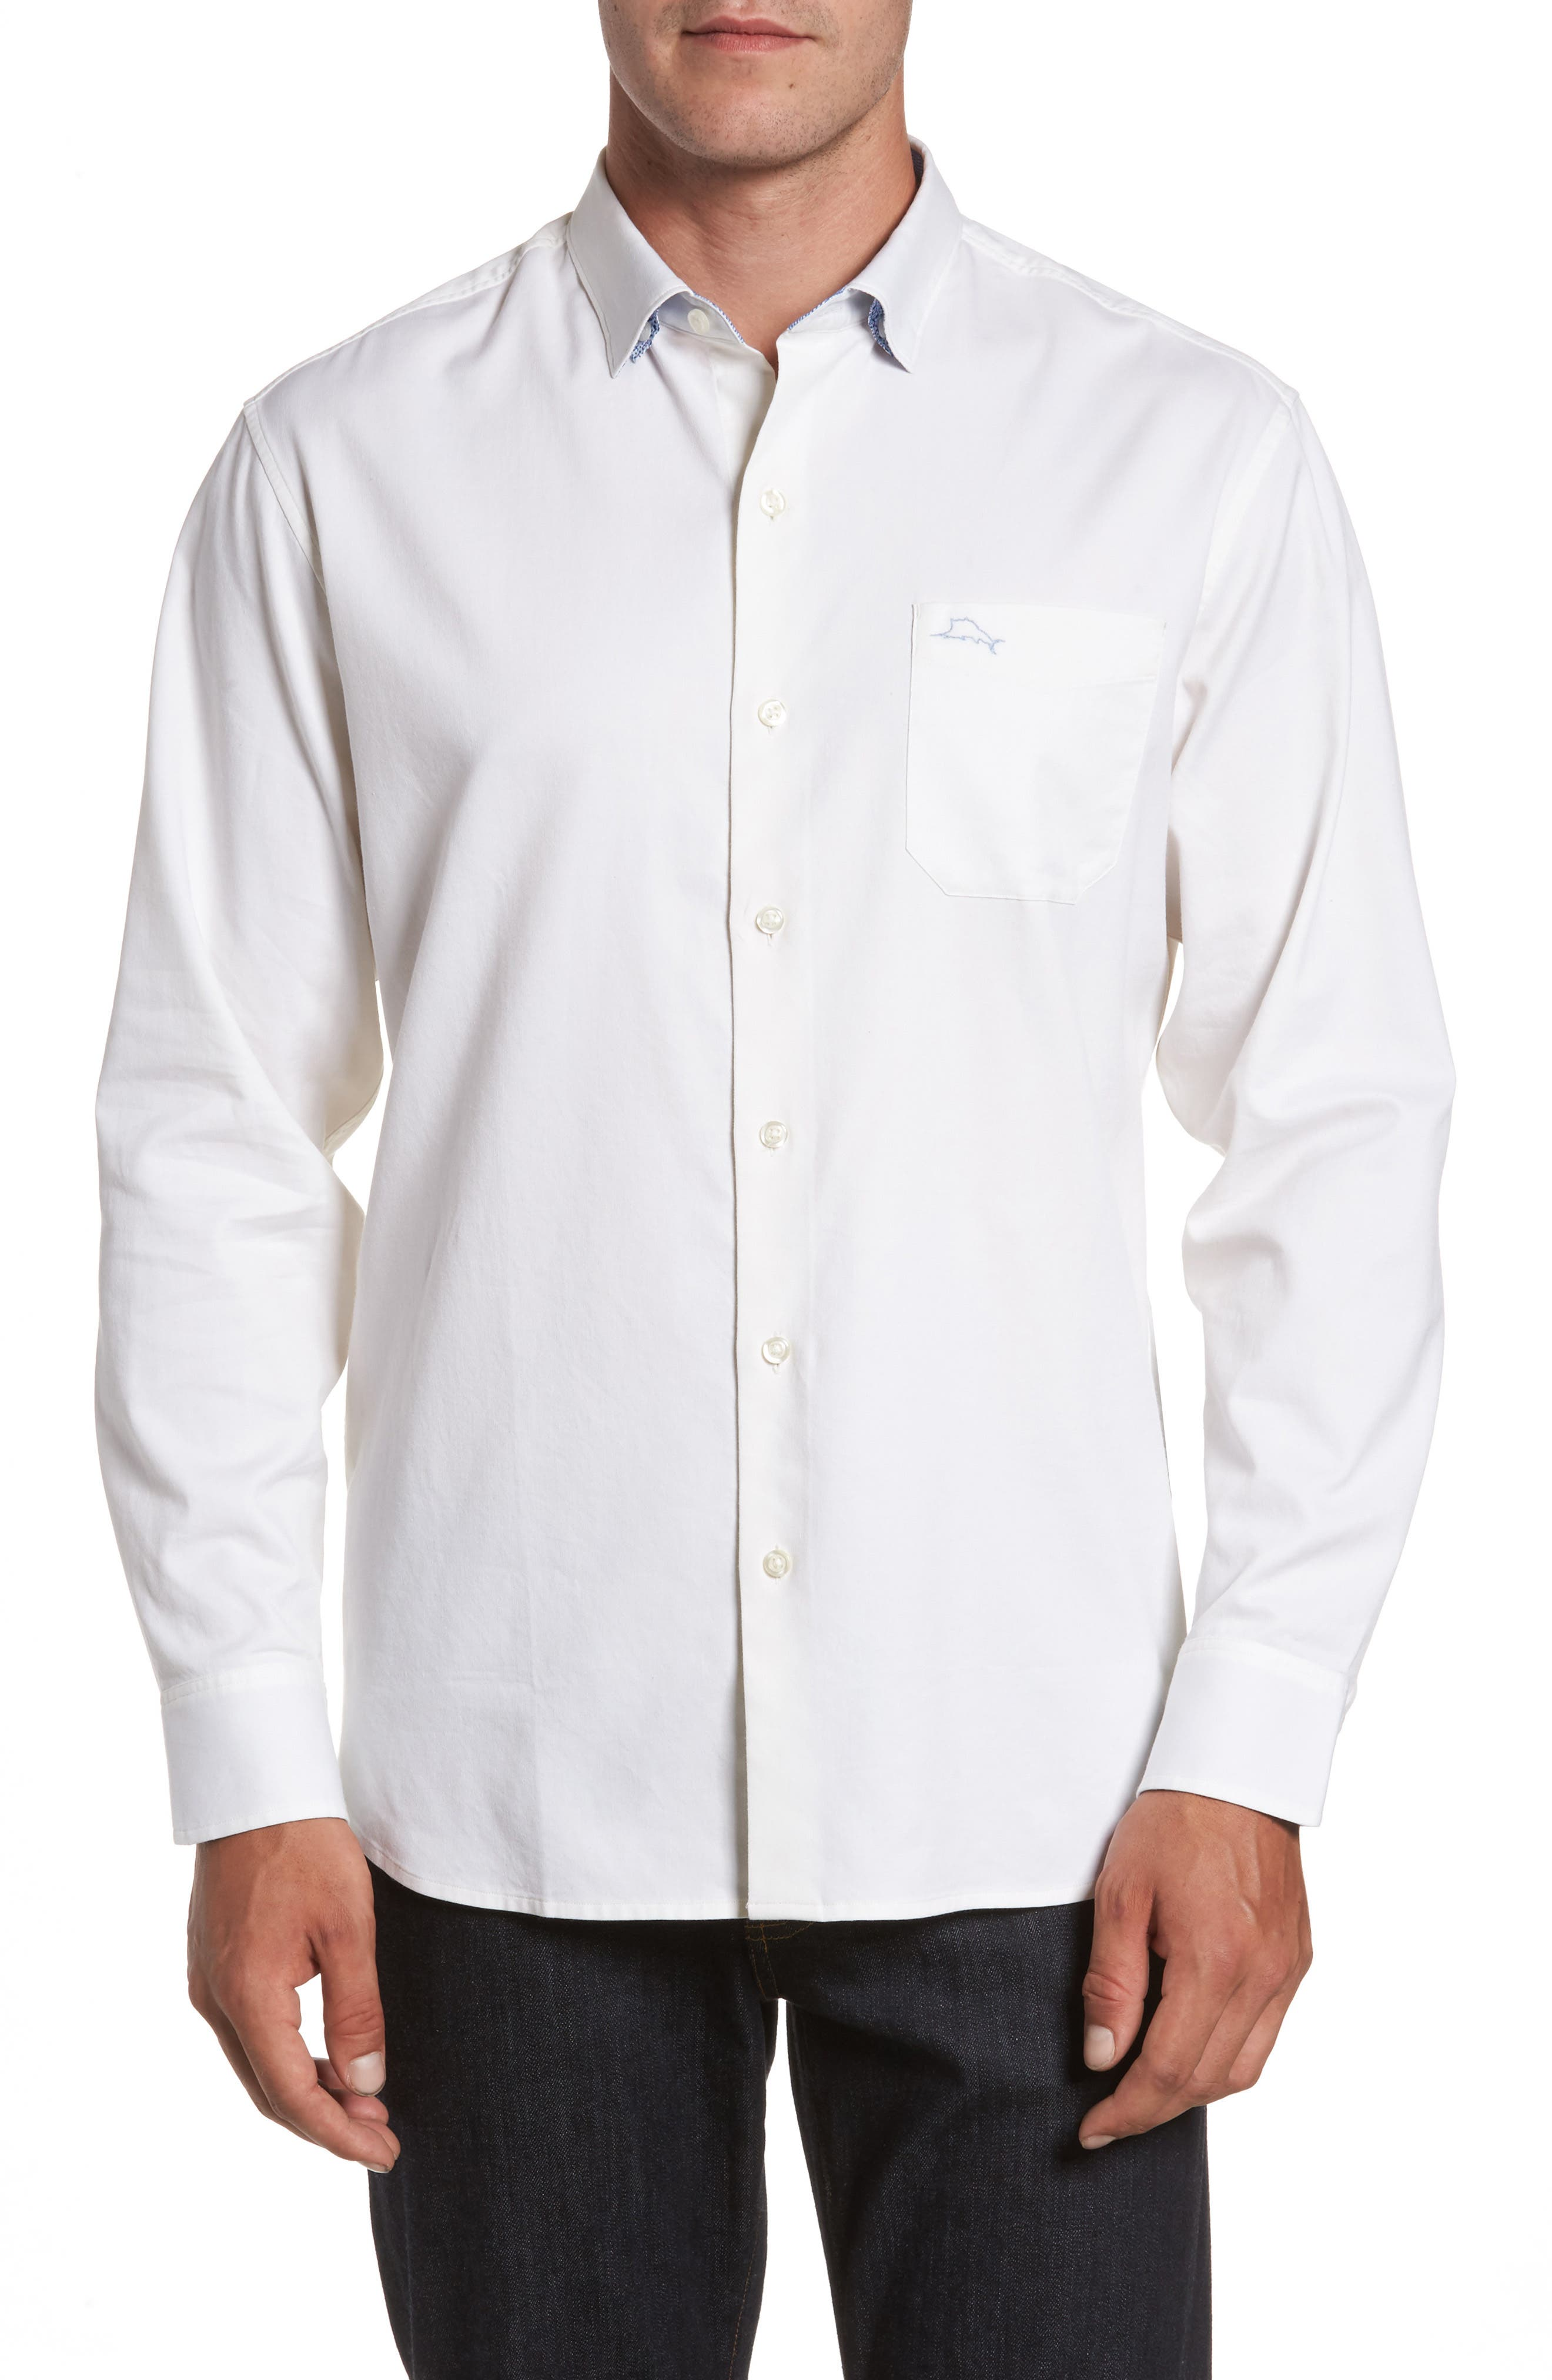 Oasis Twill Sport Shirt,                             Main thumbnail 1, color,                             WHITE